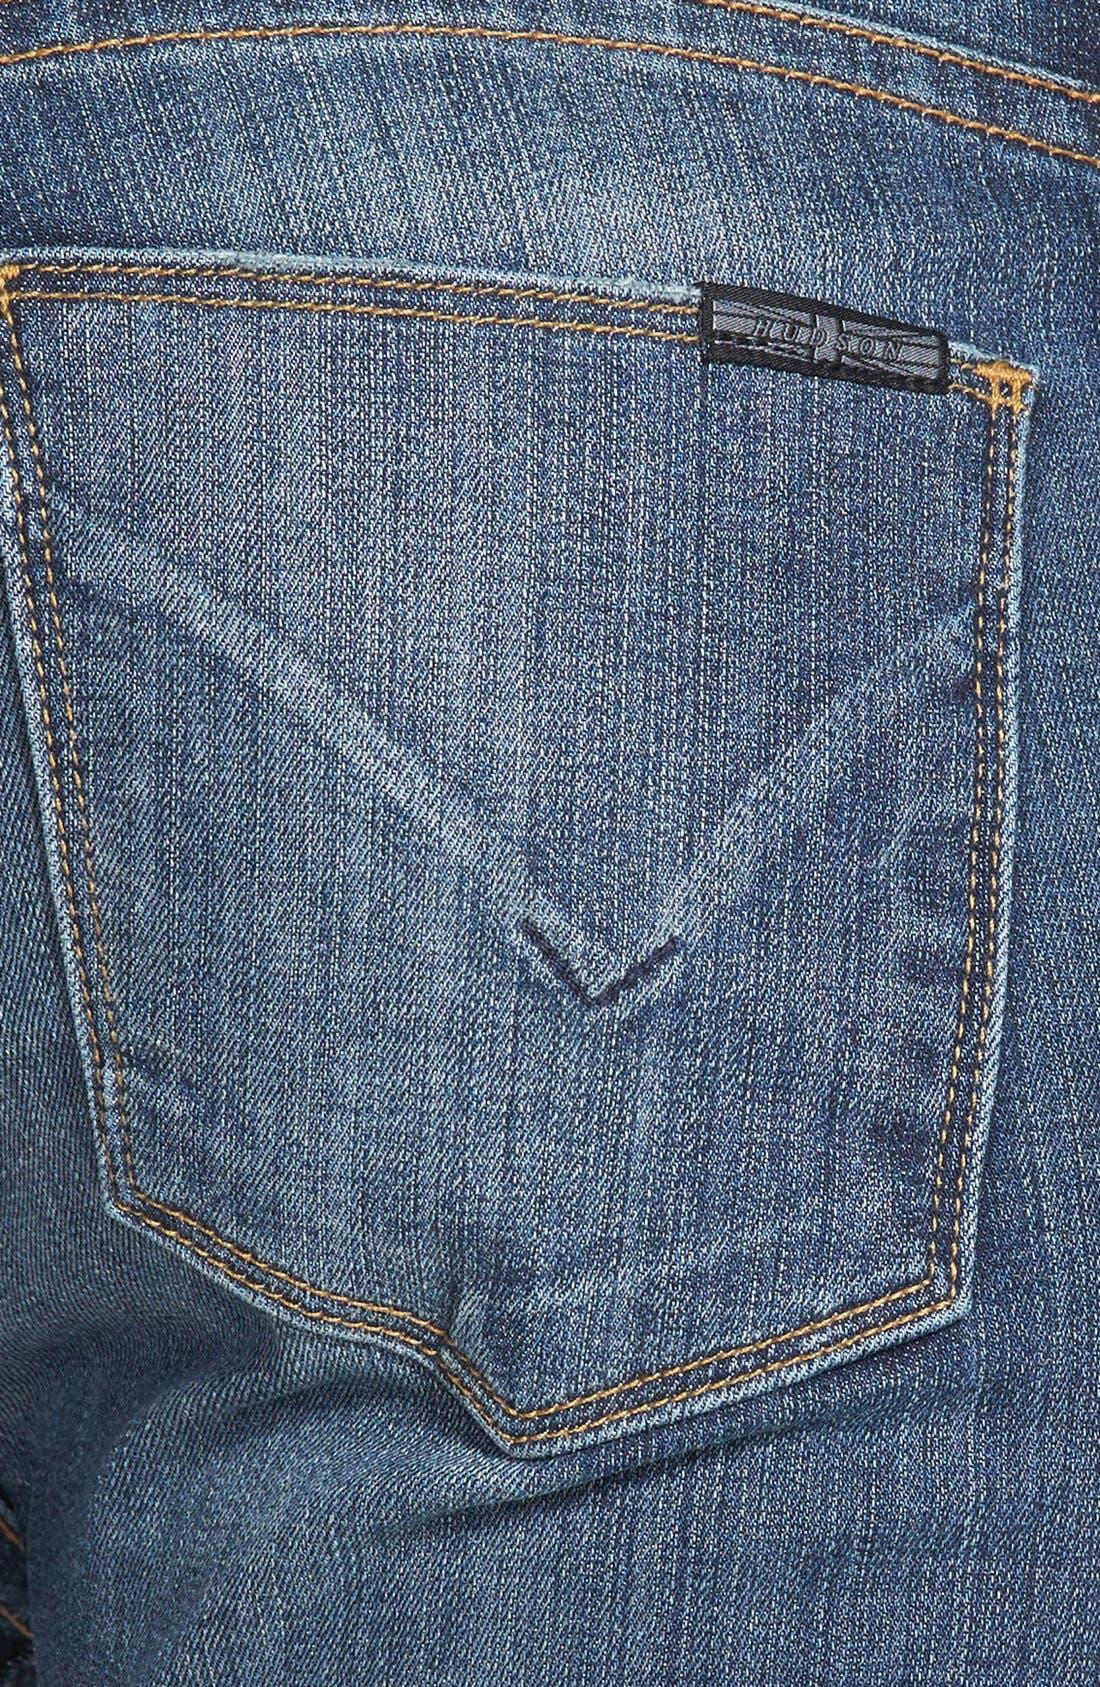 Alternate Image 3  - Hudson Jeans 'Collette' Skinny Ankle Jeans (Glam)